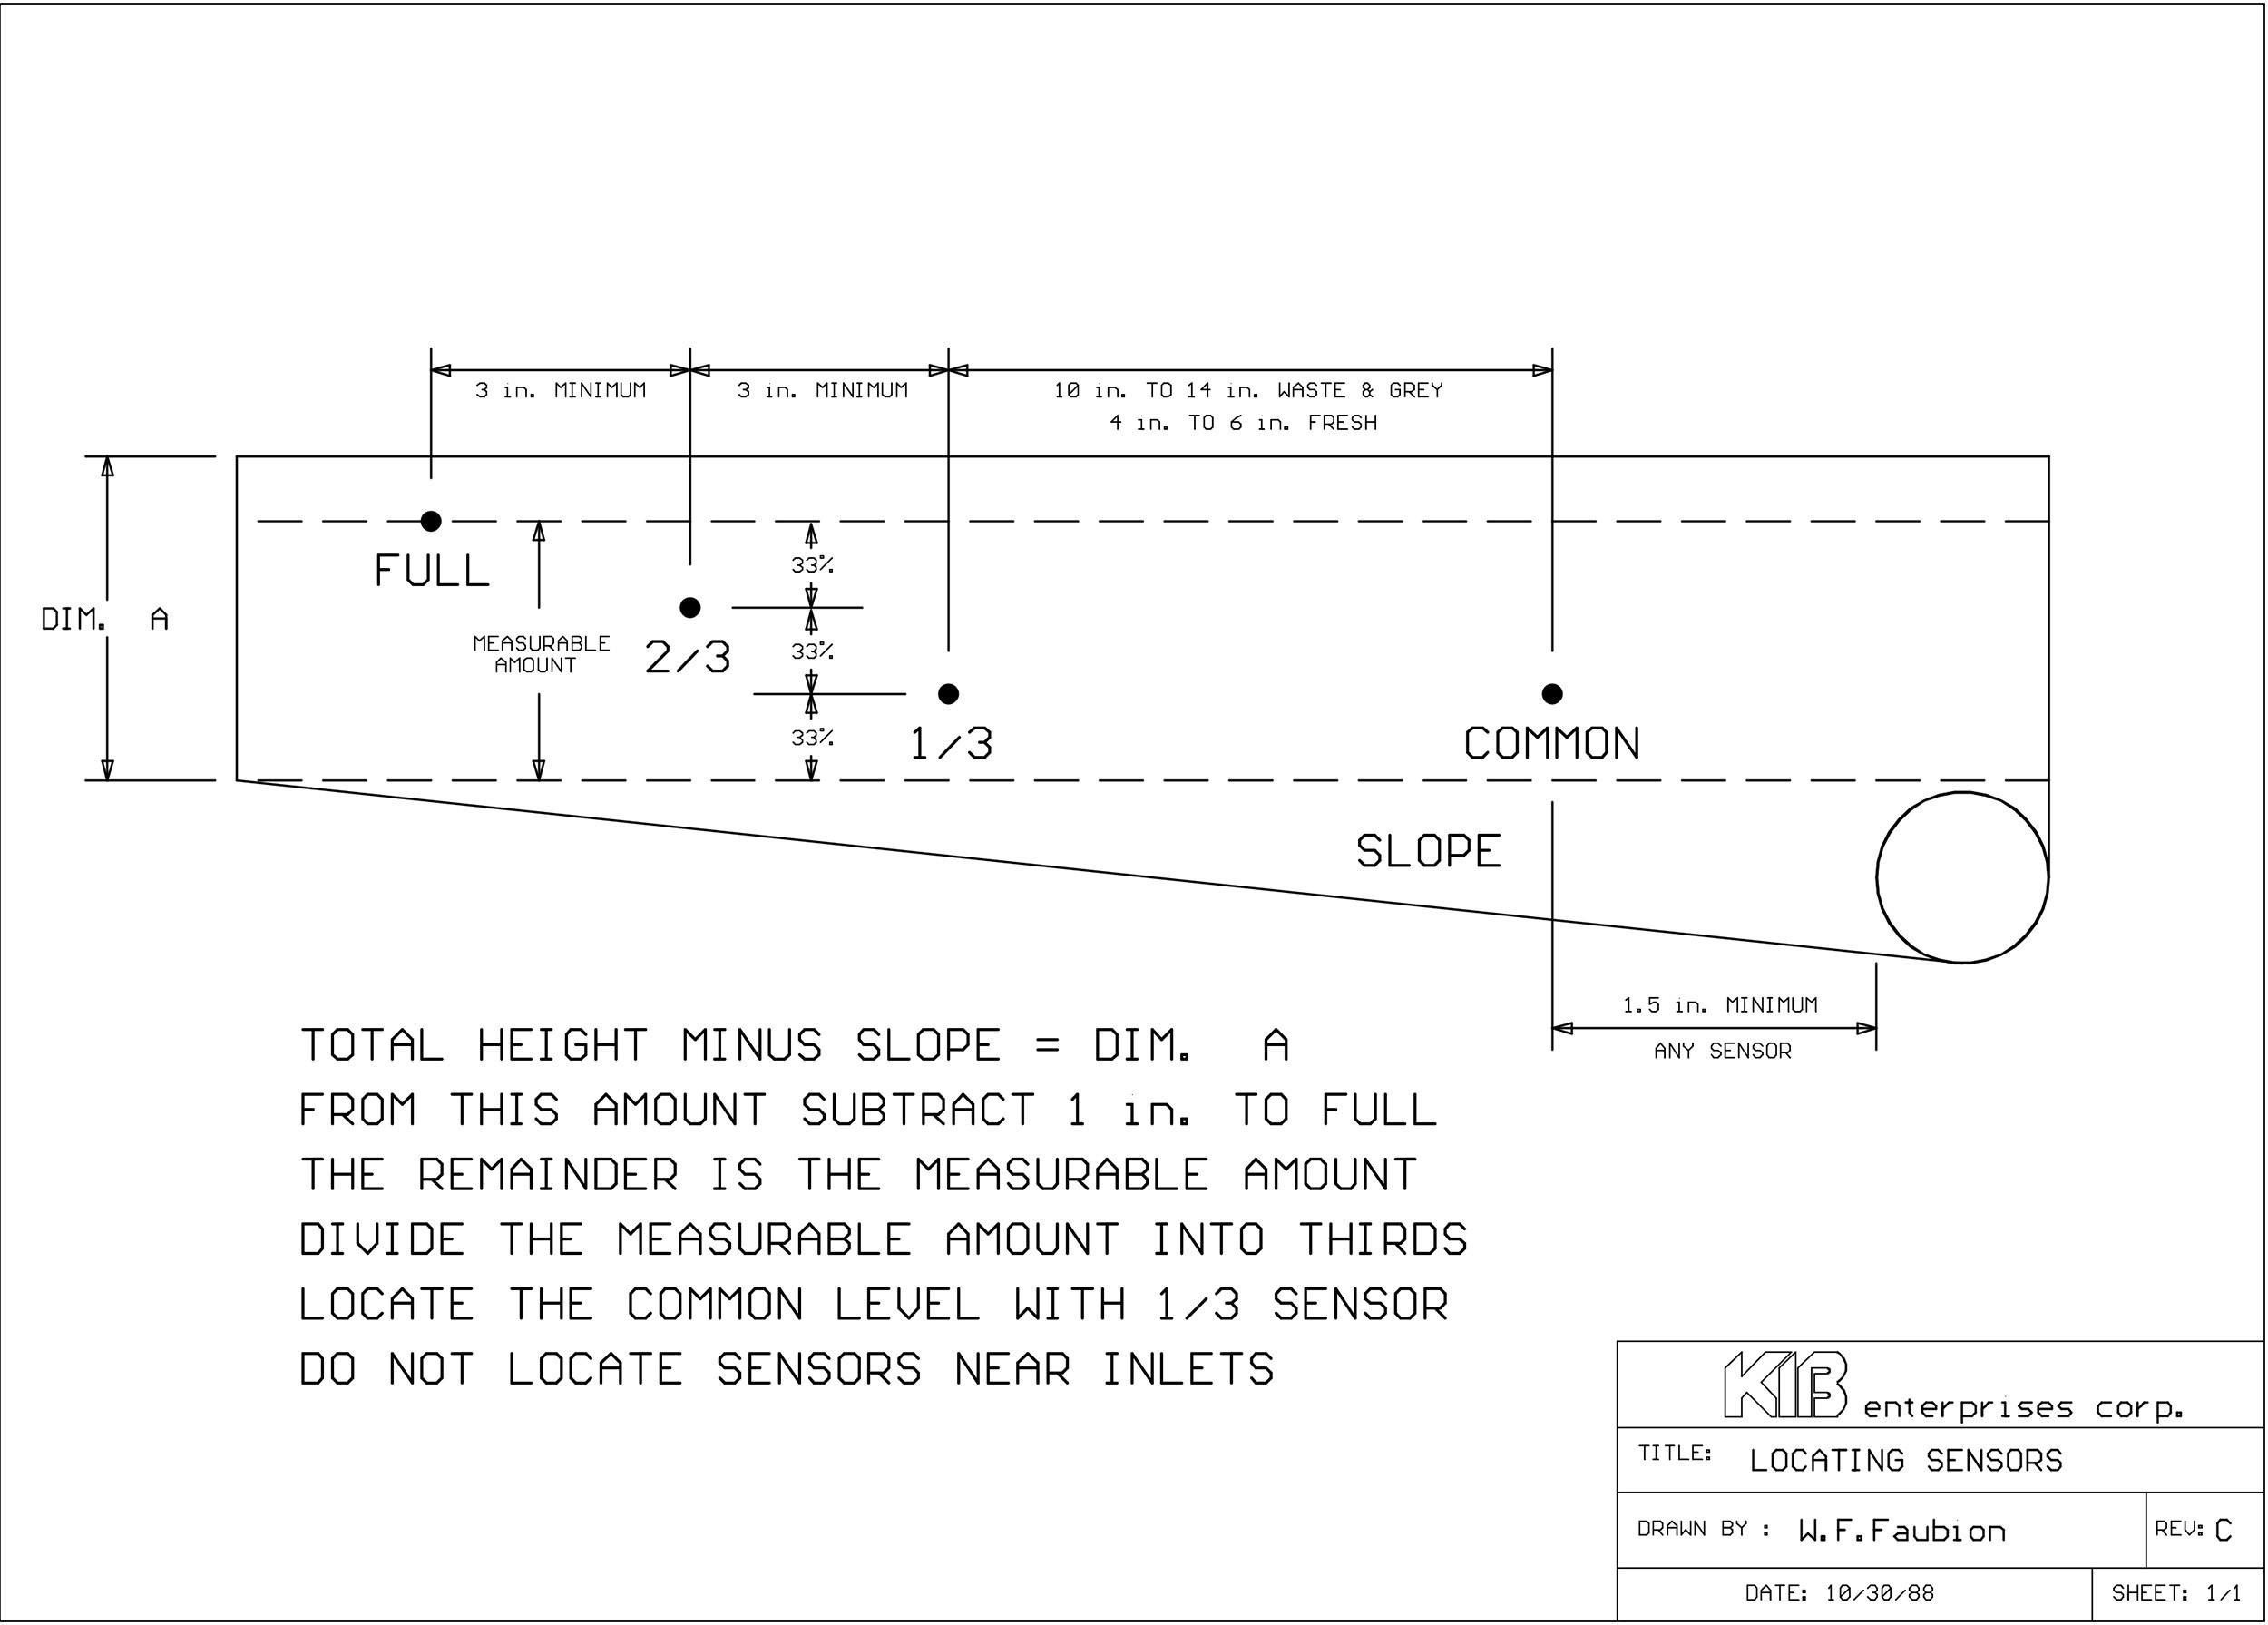 Kib Monitor Panel Diaghram Vz 6646] Rv Holding Tank Sensor Wiring Free Diagram Of Kib Monitor Panel Diaghram